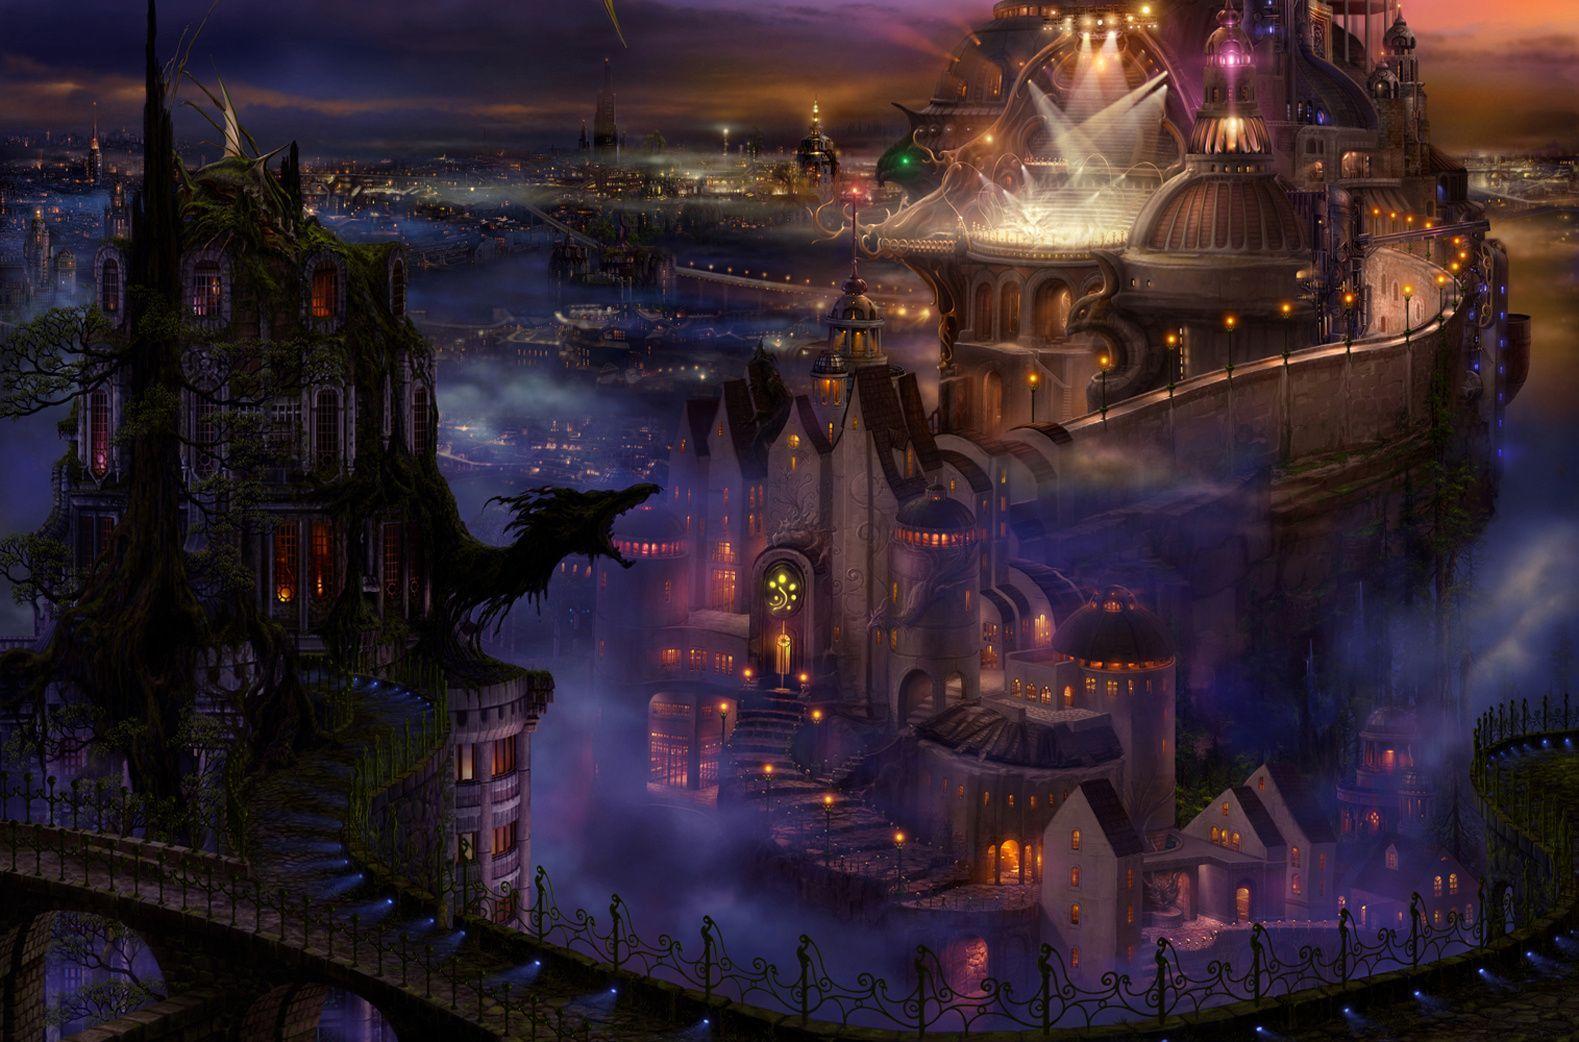 Magical Fantasy Hd Wallpapers That Will Take Your Breathe: A Futuristic Fantasy Castle! Night-castle-dragon-fantasy